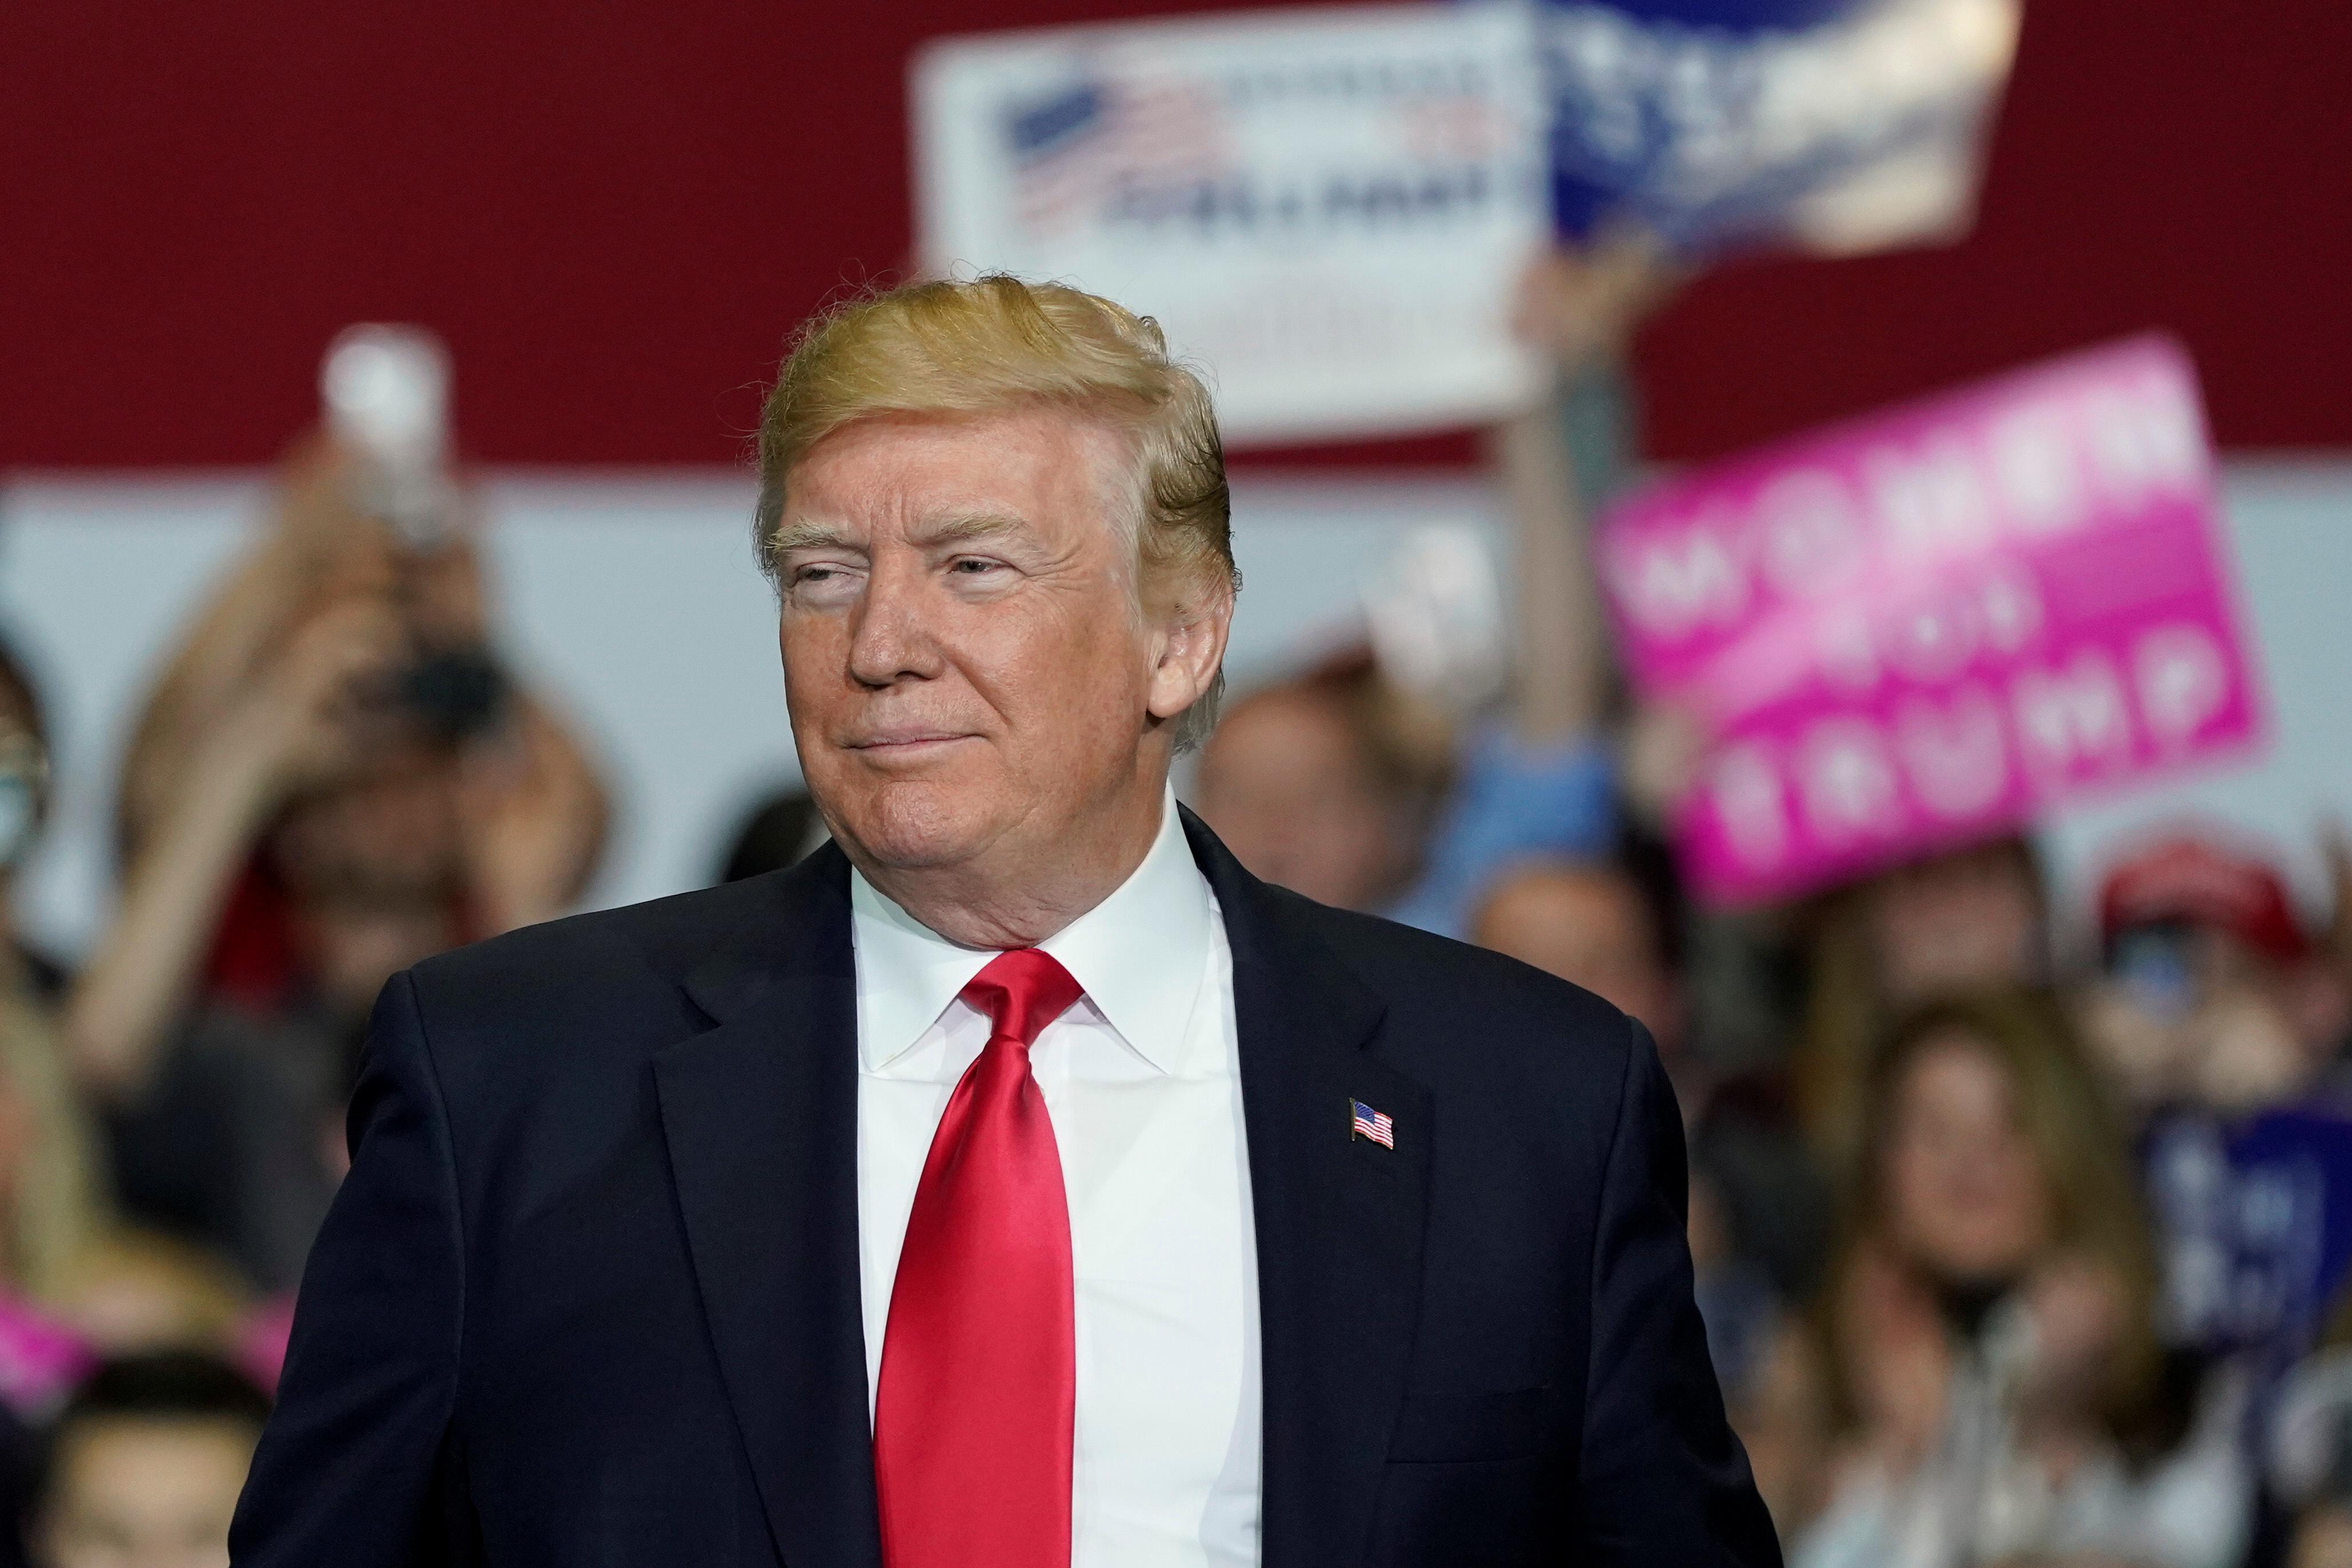 U.S. President Donald Trump arrives to speak at a Make America Great Again Rally in Washington, Michigan April 28, 2018. (REUTERS/Joshua Roberts)